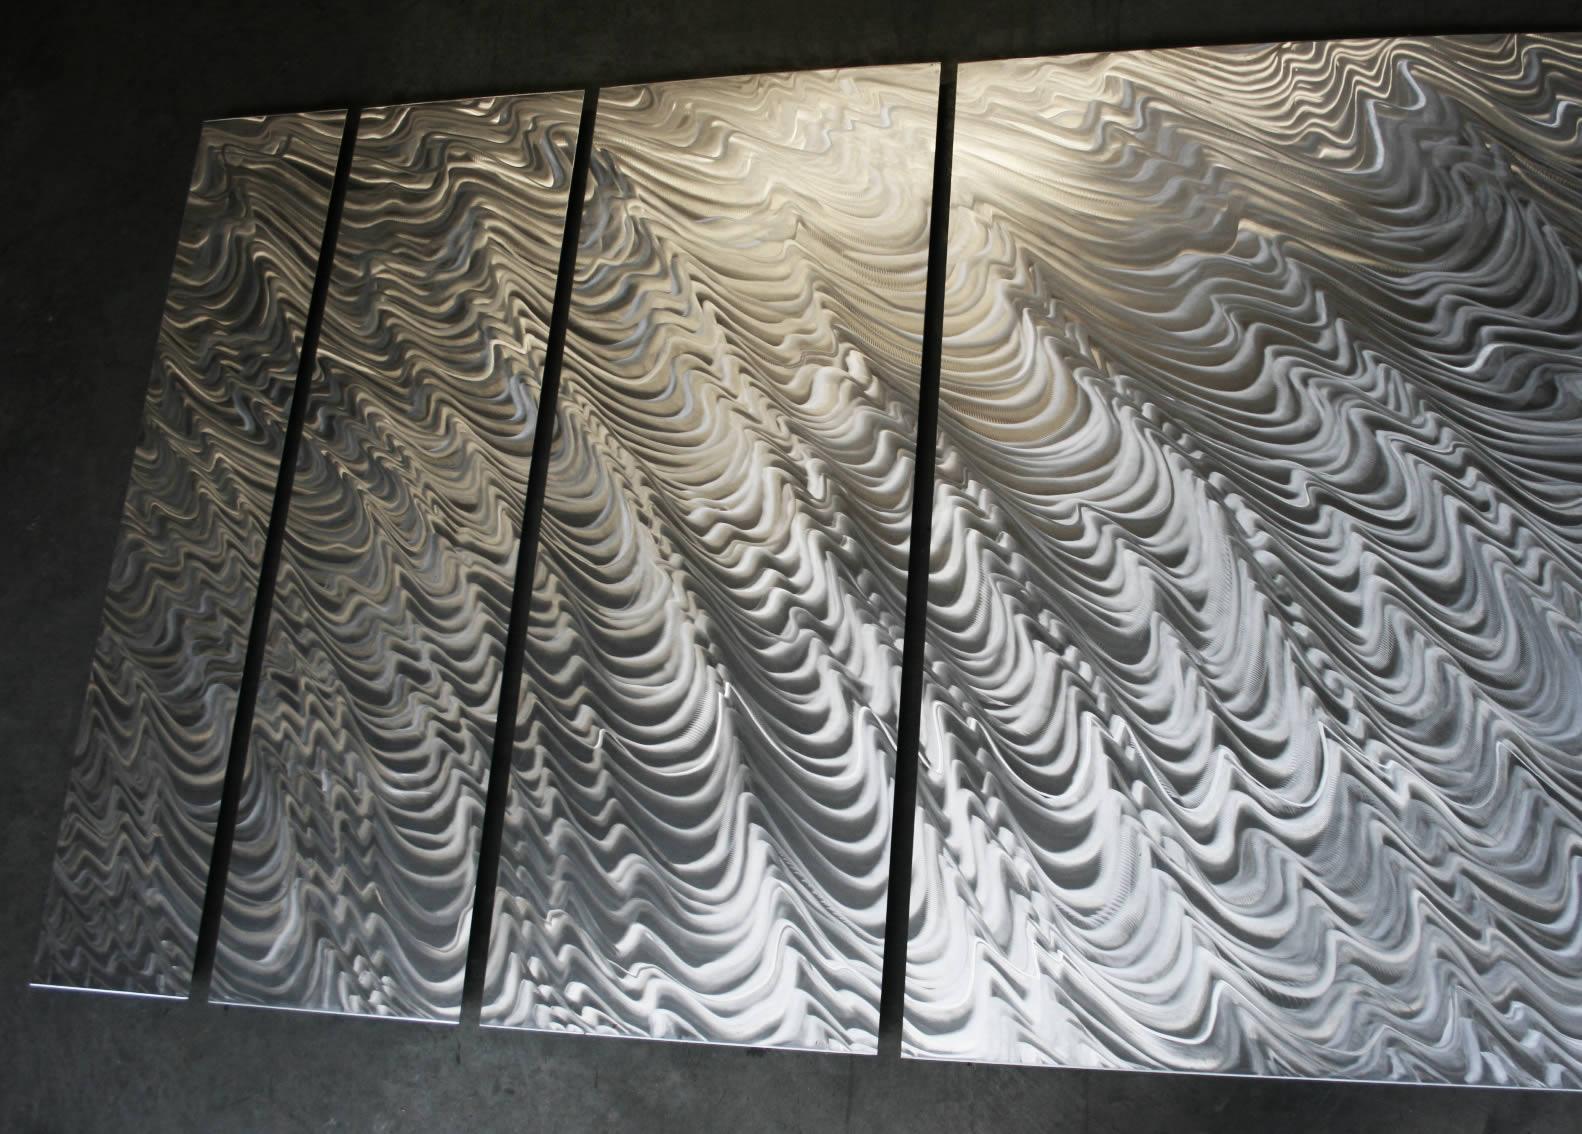 NYT0056M - Metal Art by Nicholas Yust, Alternate Angle 2